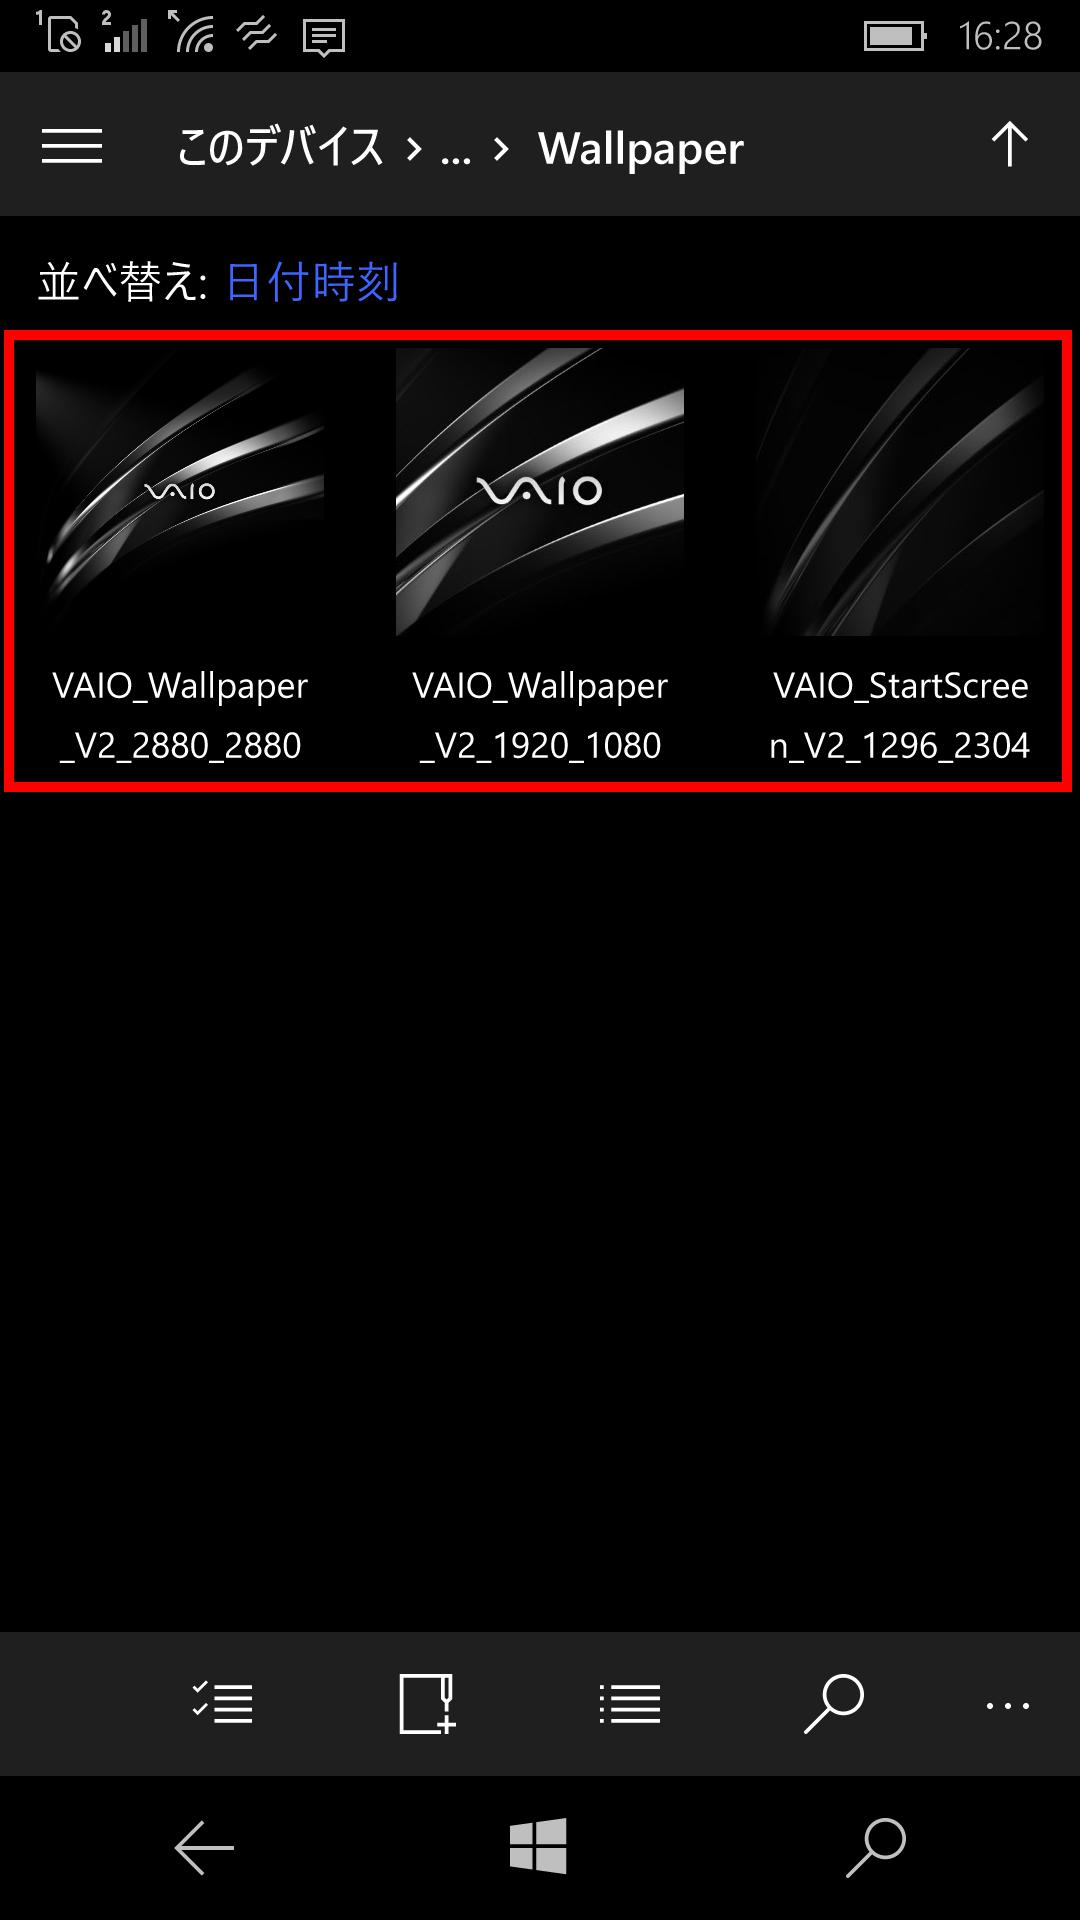 vaio wallpaper 2015